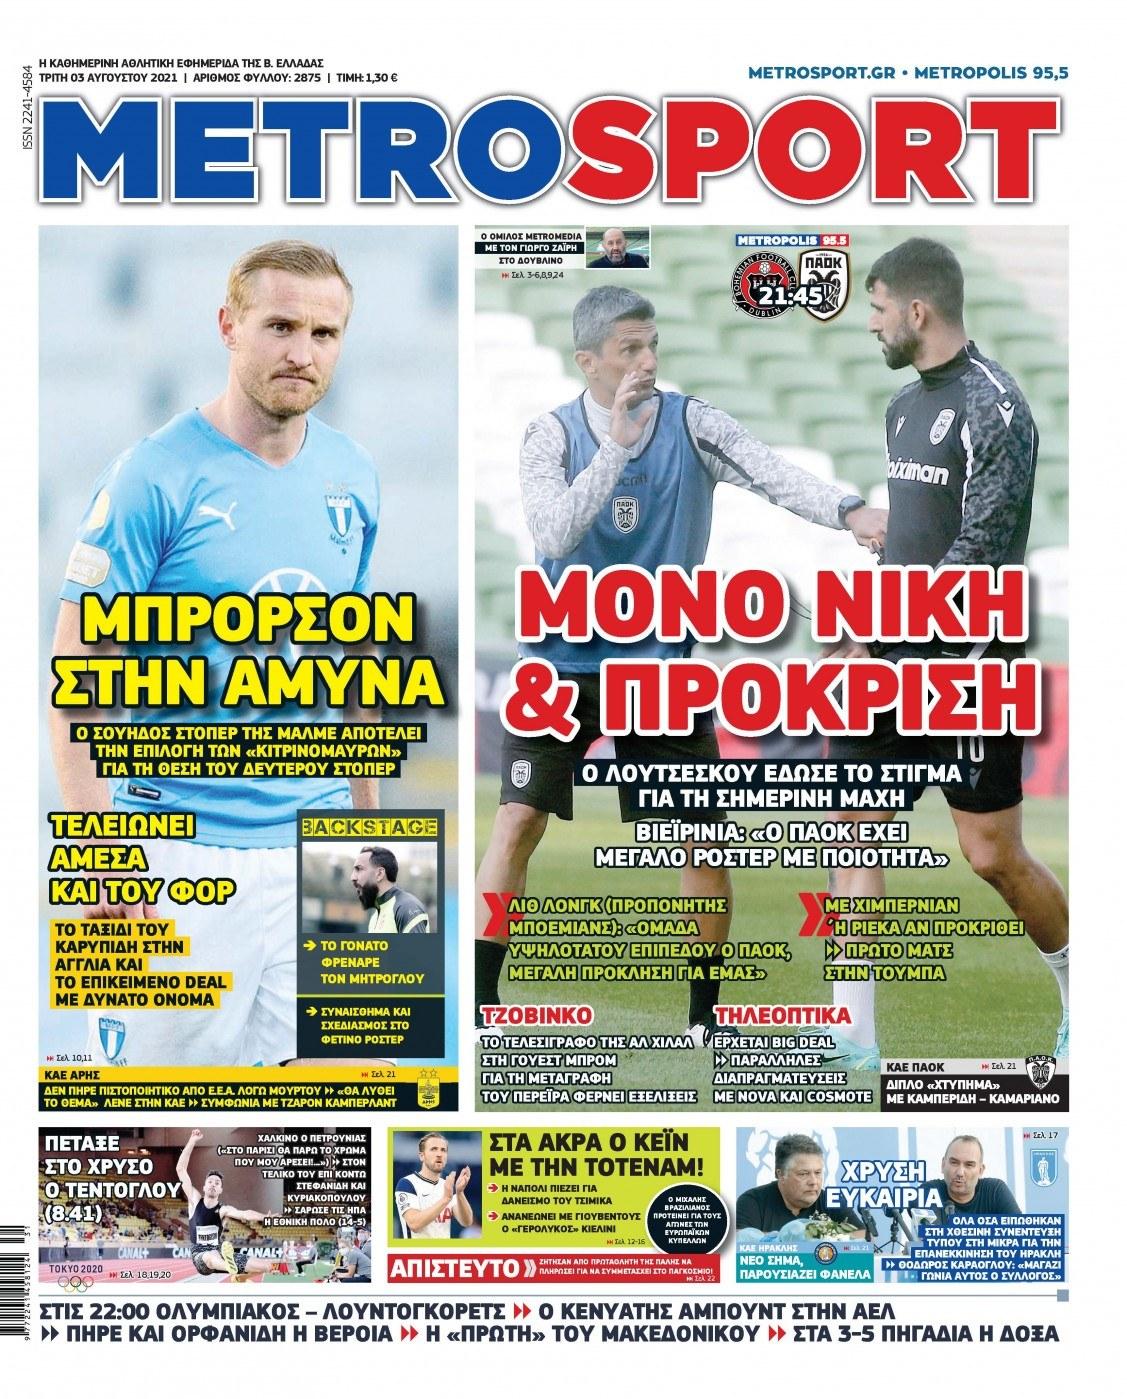 Metrosport 3.8